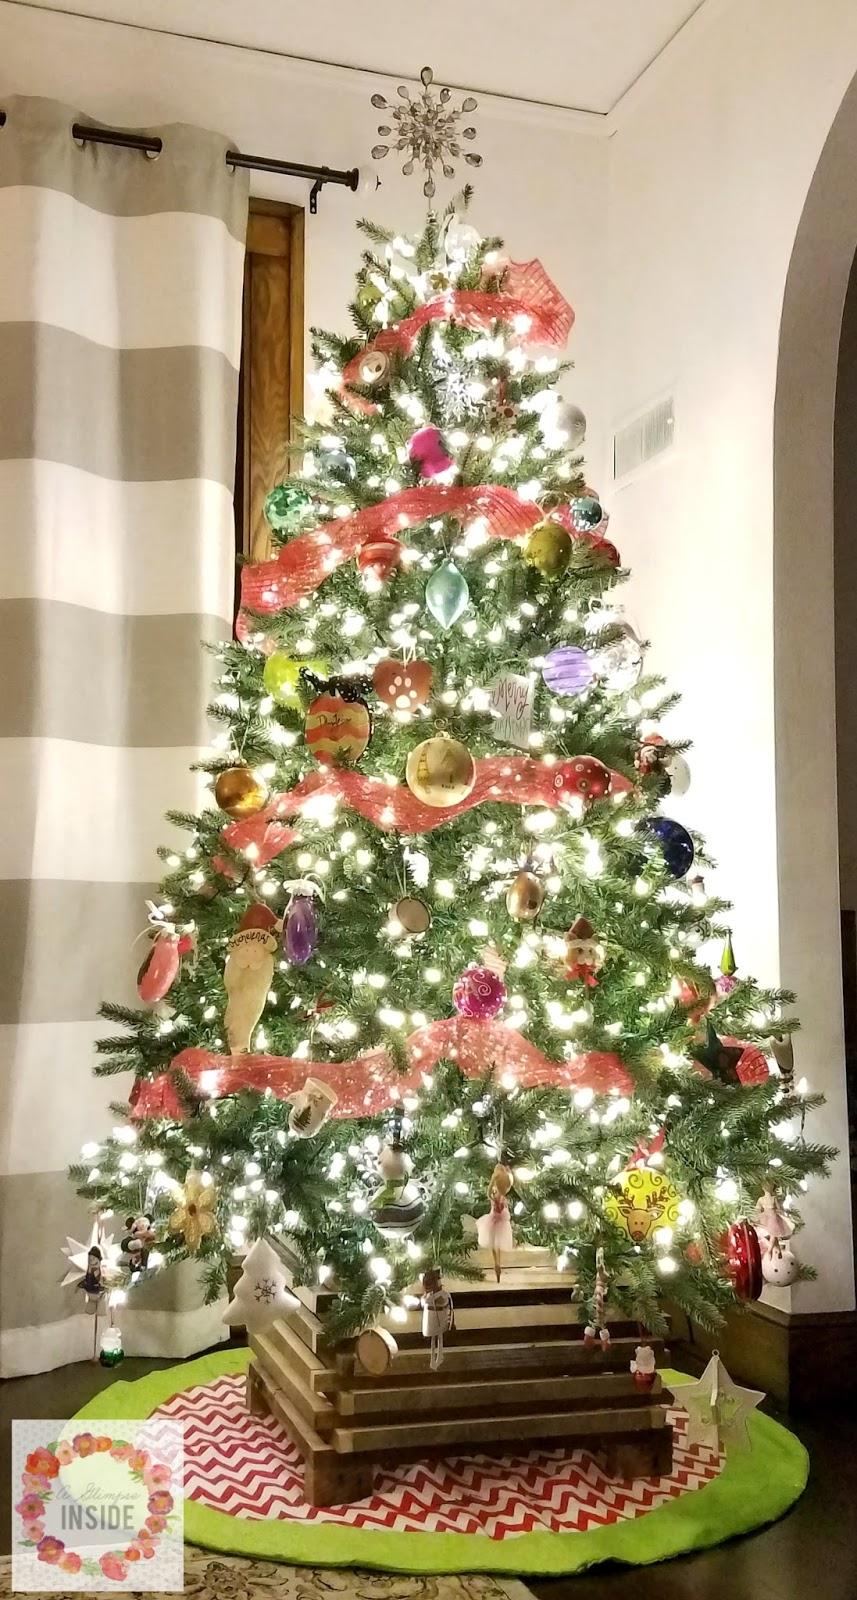 diy rustic christmas tree stand a glimpse inside. Black Bedroom Furniture Sets. Home Design Ideas